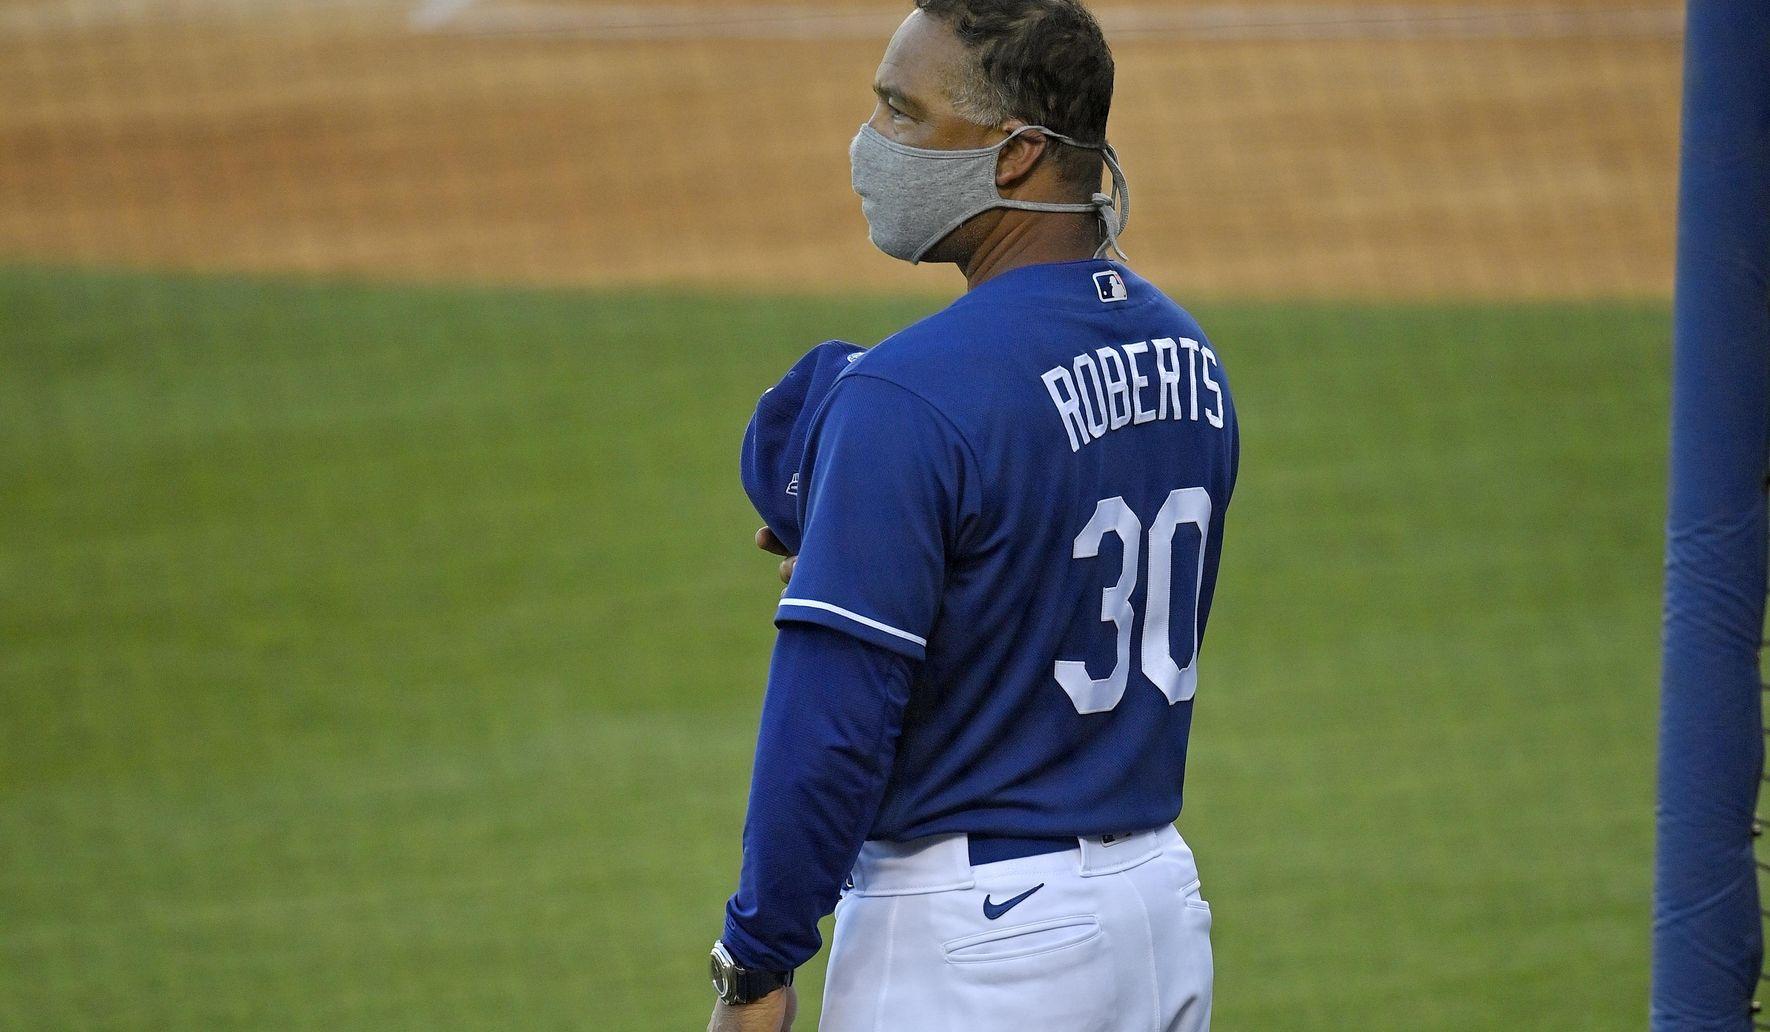 Dodgers_baseball_80158_c0-155-3712-2319_s1770x1032